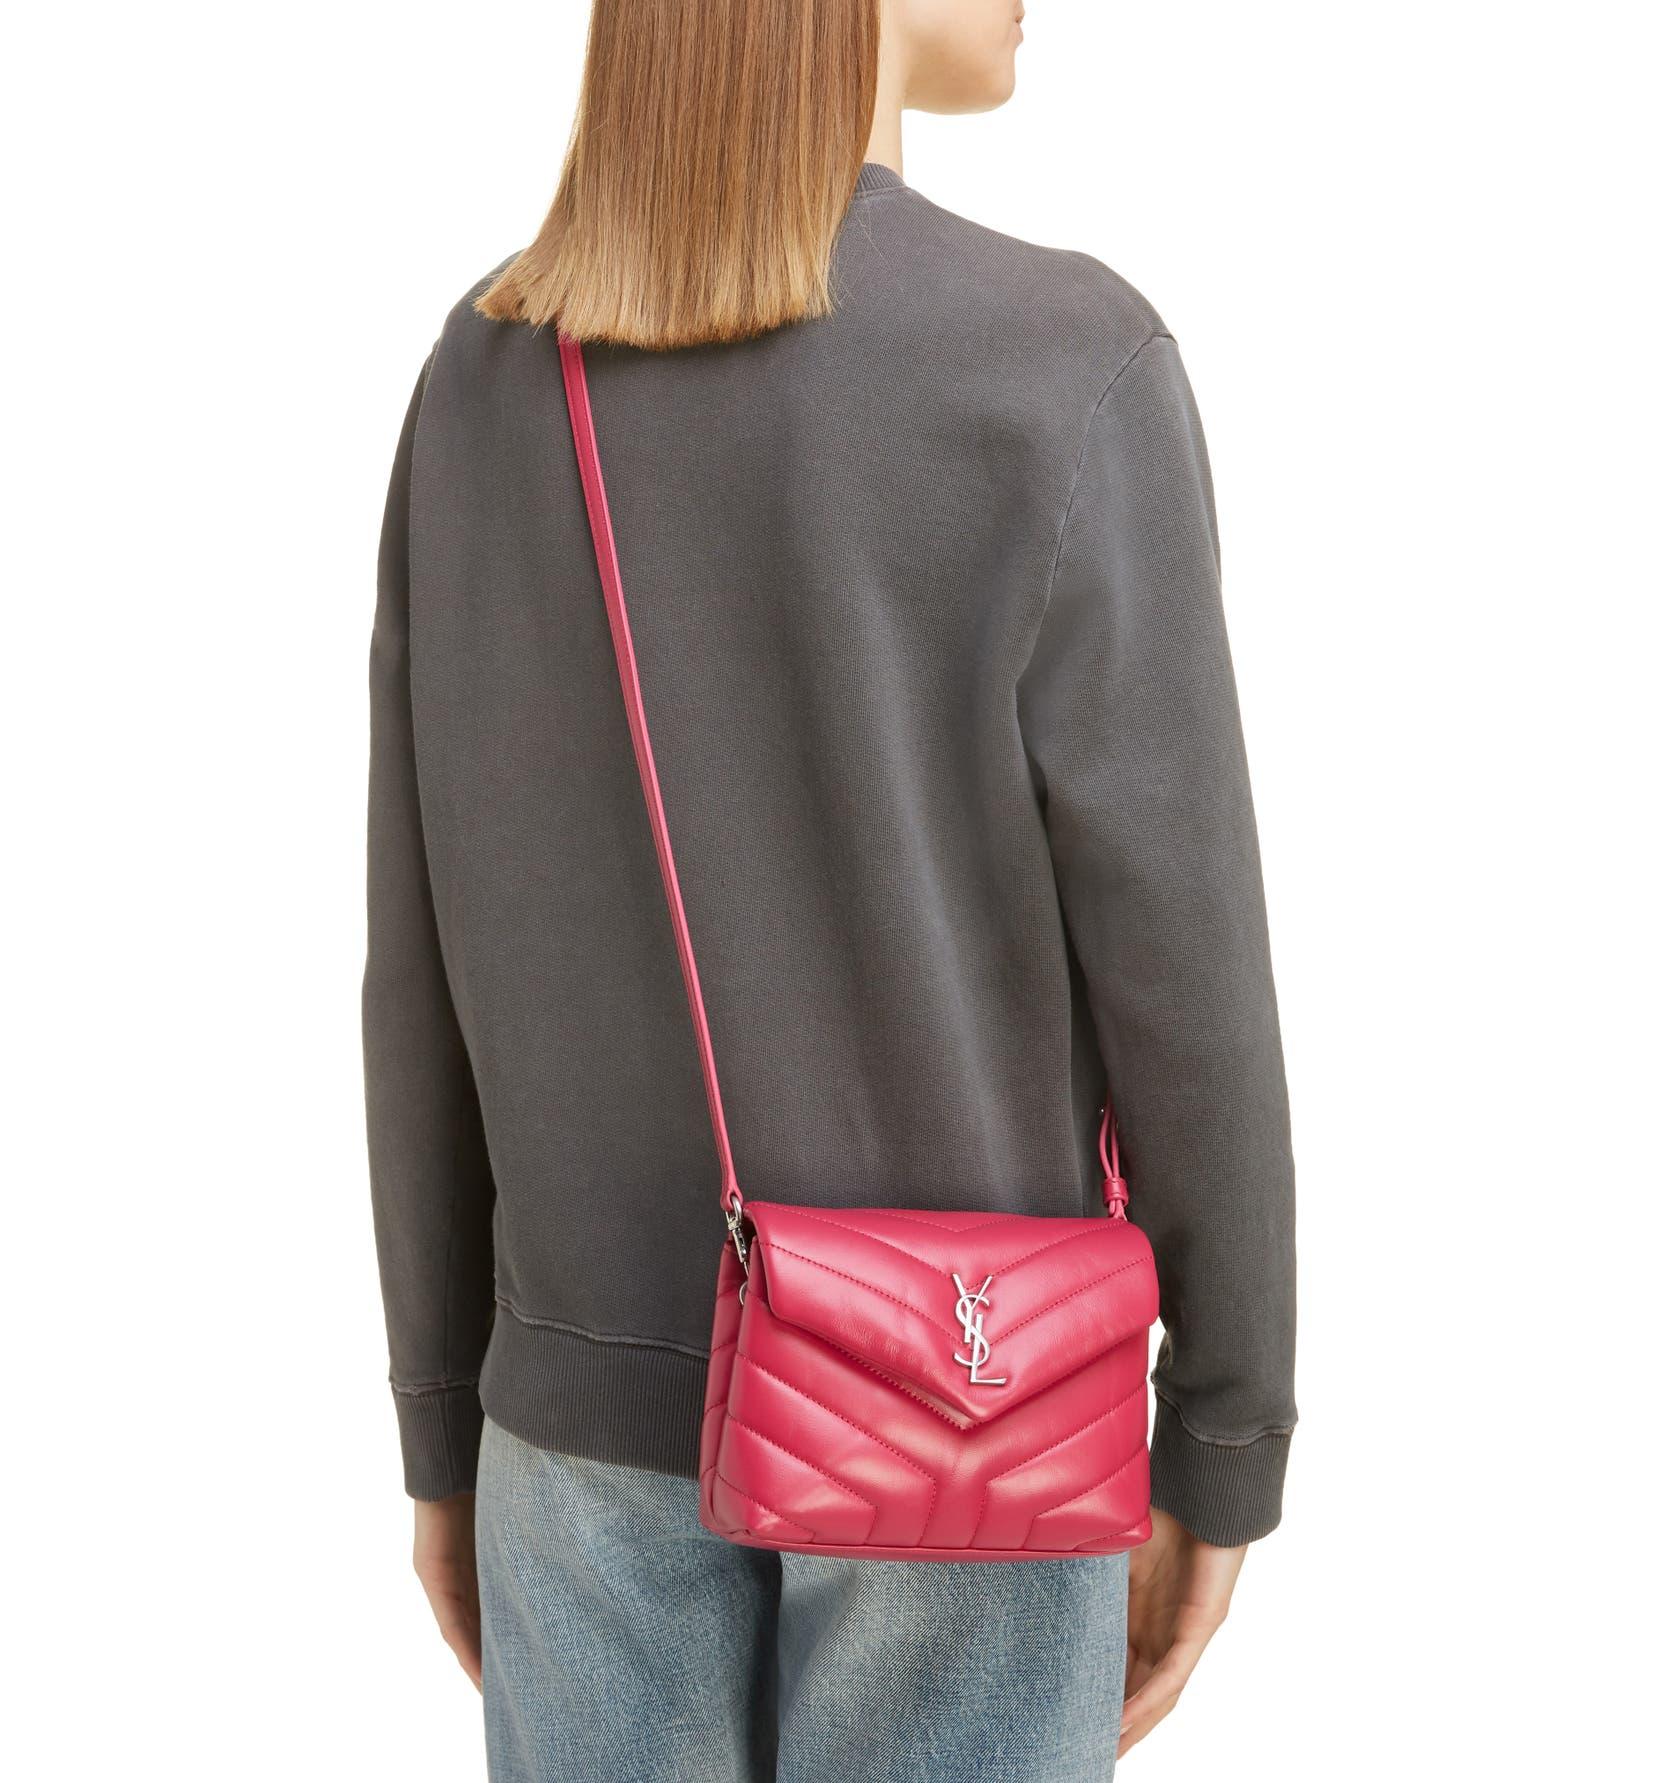 264558f0d7f Saint Laurent Toy Loulou Calfskin Leather Crossbody Bag | Nordstrom